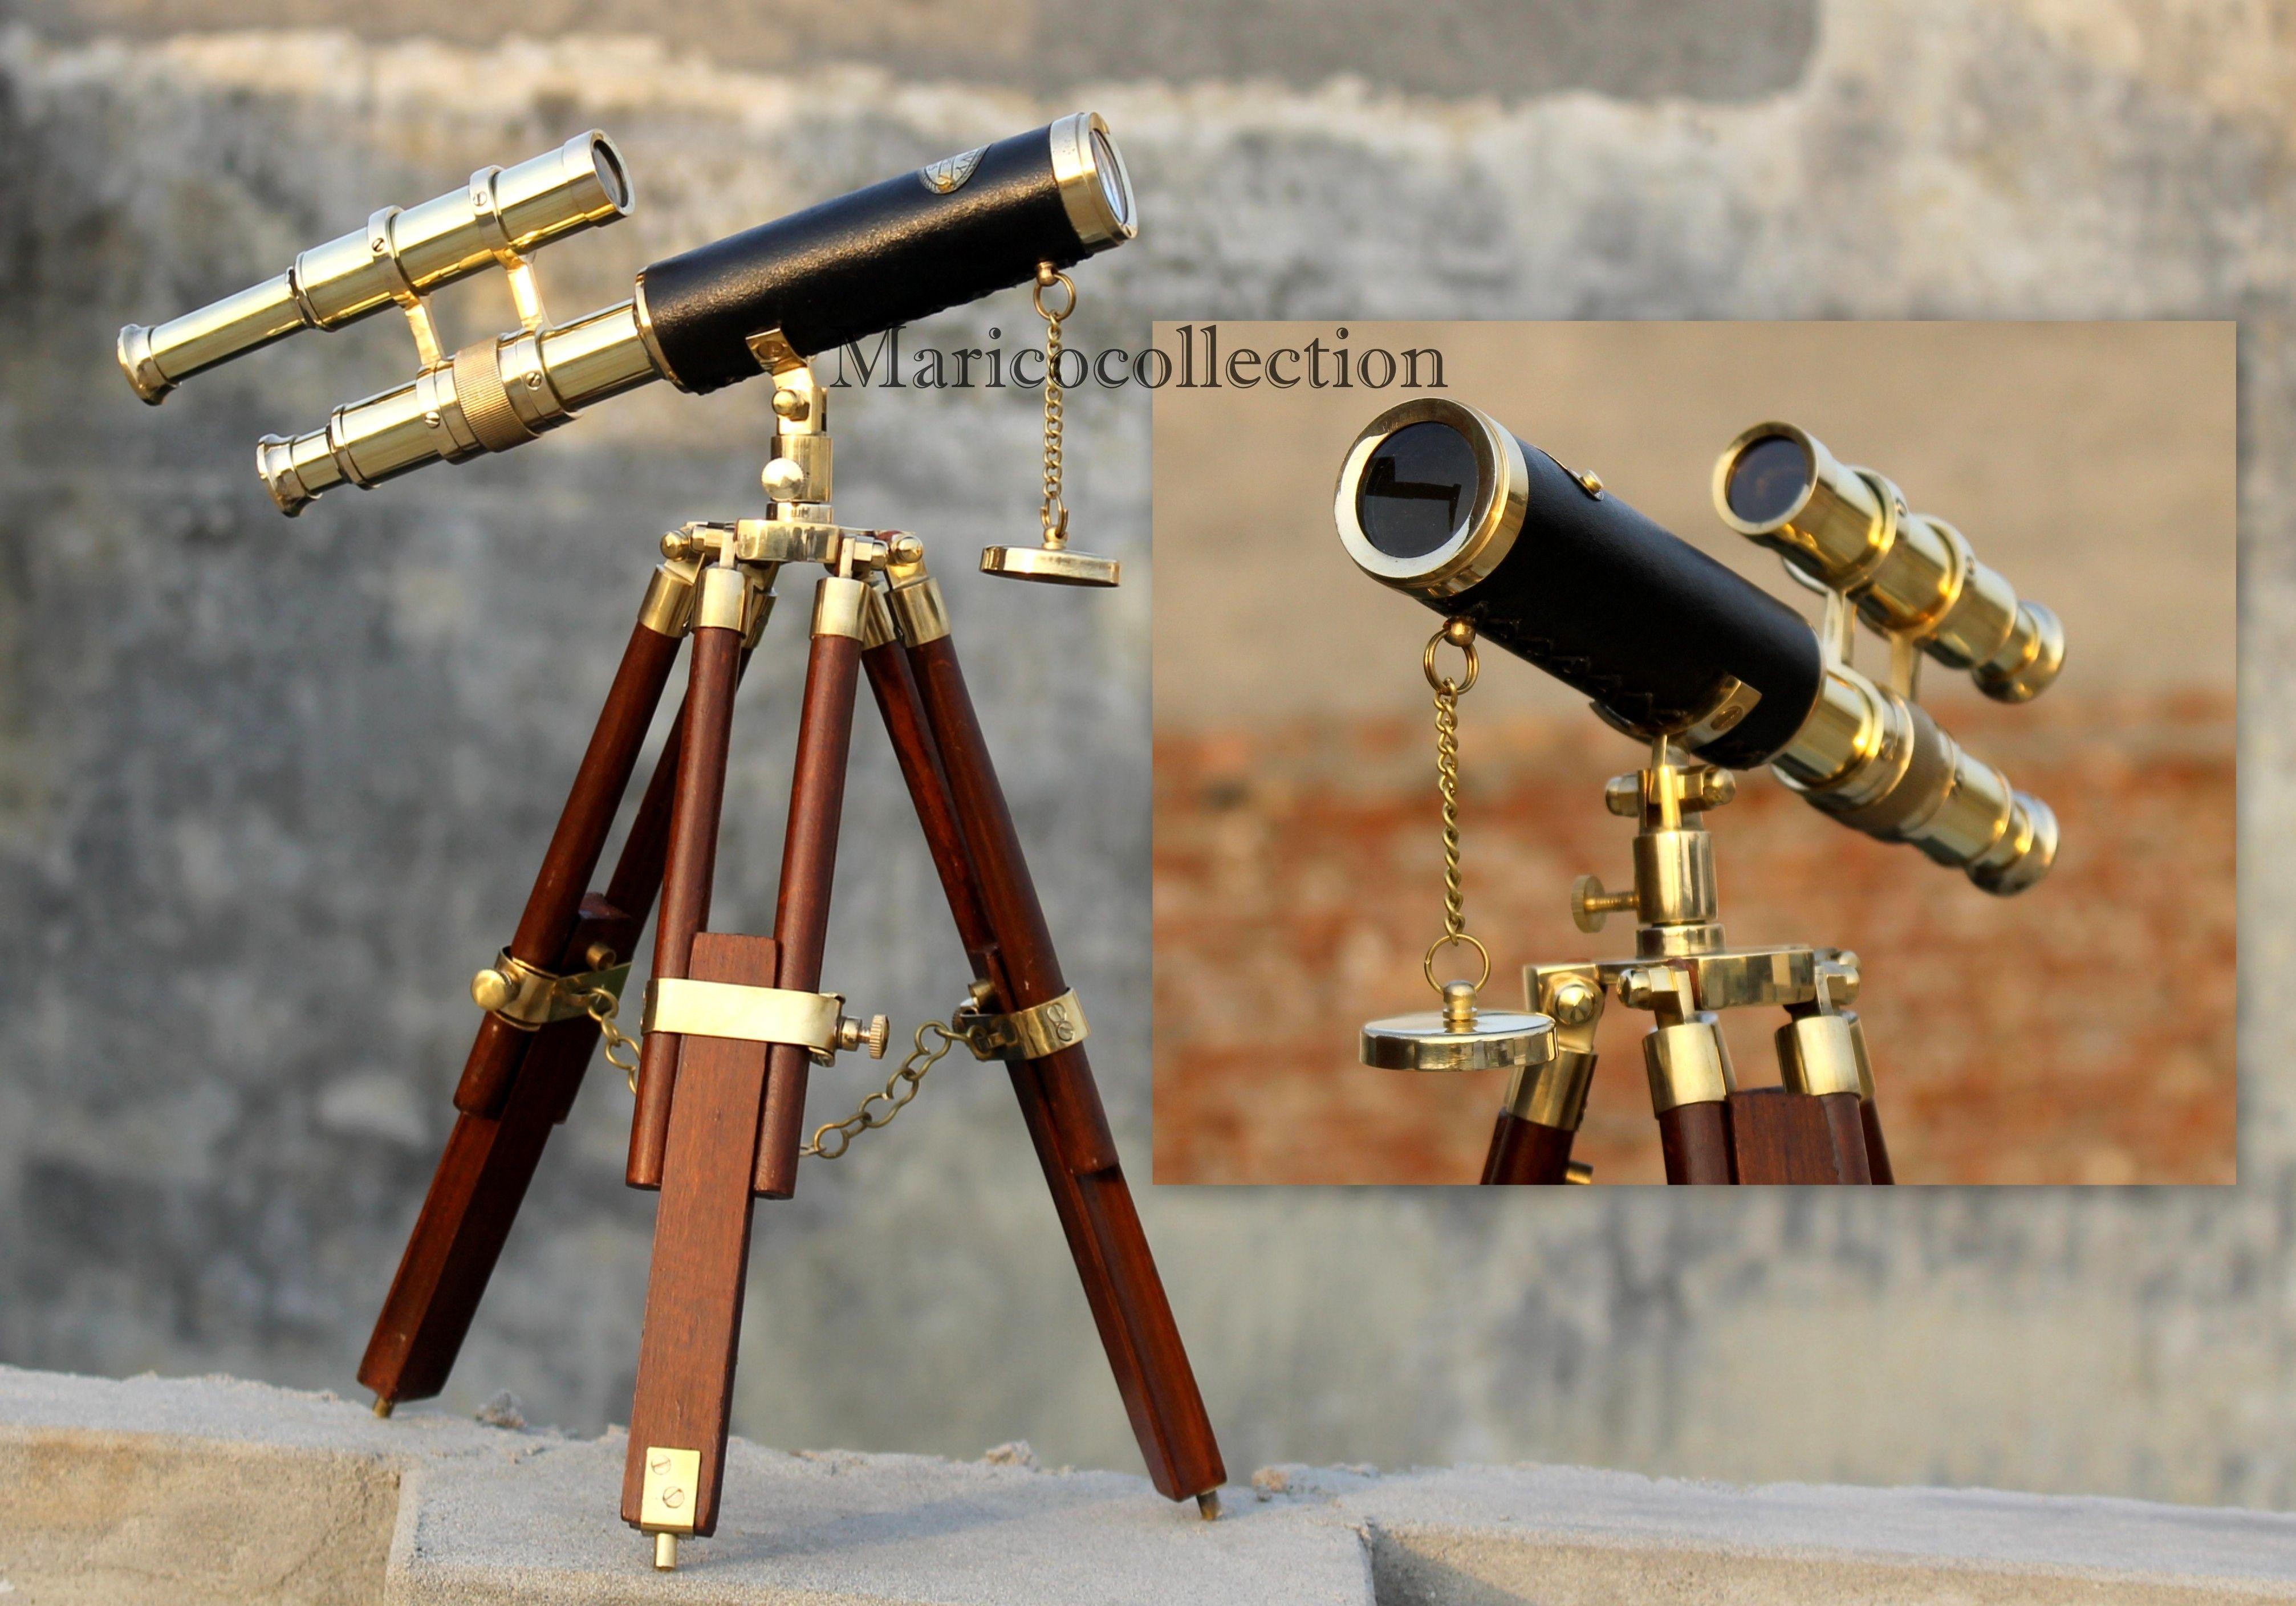 Handmade Telescope Marine Leather Desk Tripod Stand Antique Spyglass Decor Gift Low Price Maritime Telescopes Maritime